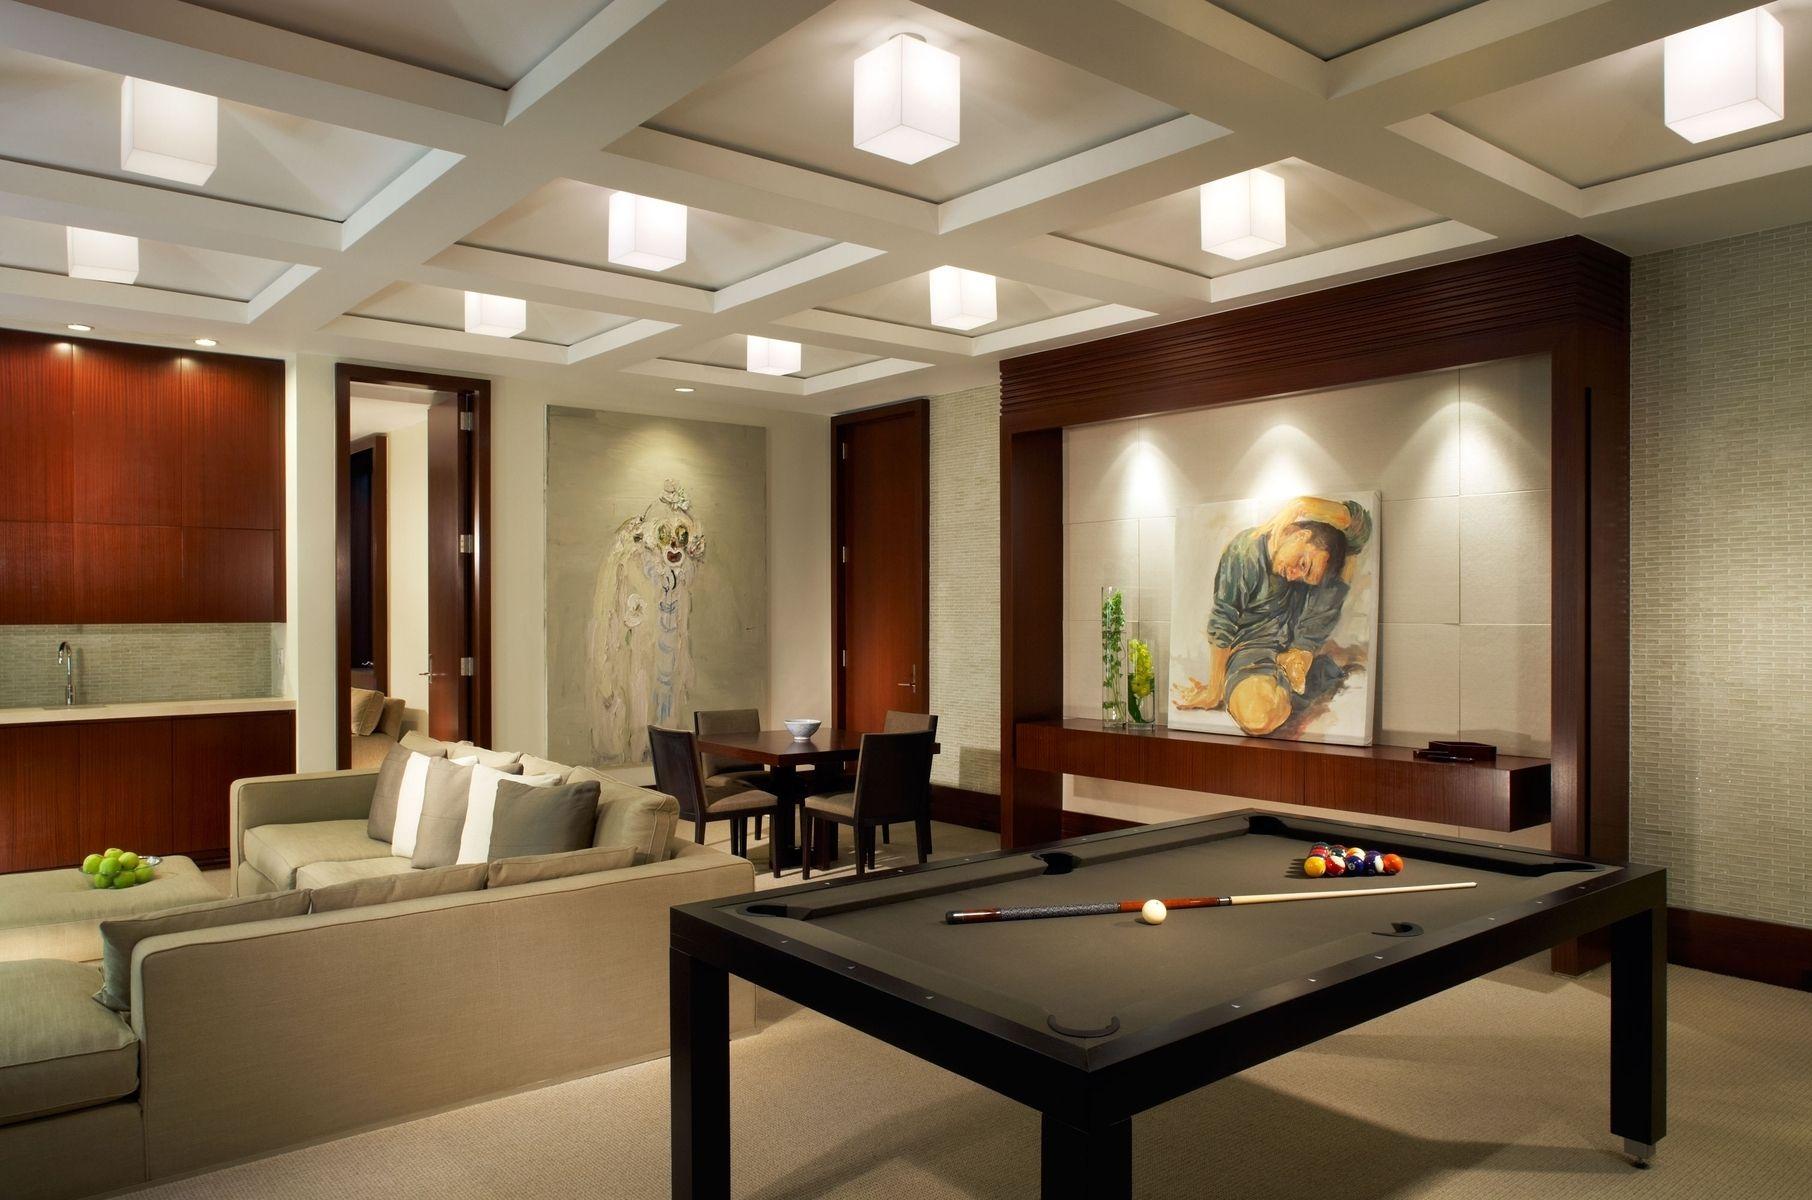 Picture Of Interesitng Futuristic Plan Game Rooms Area Design With Billiard  Table Idea